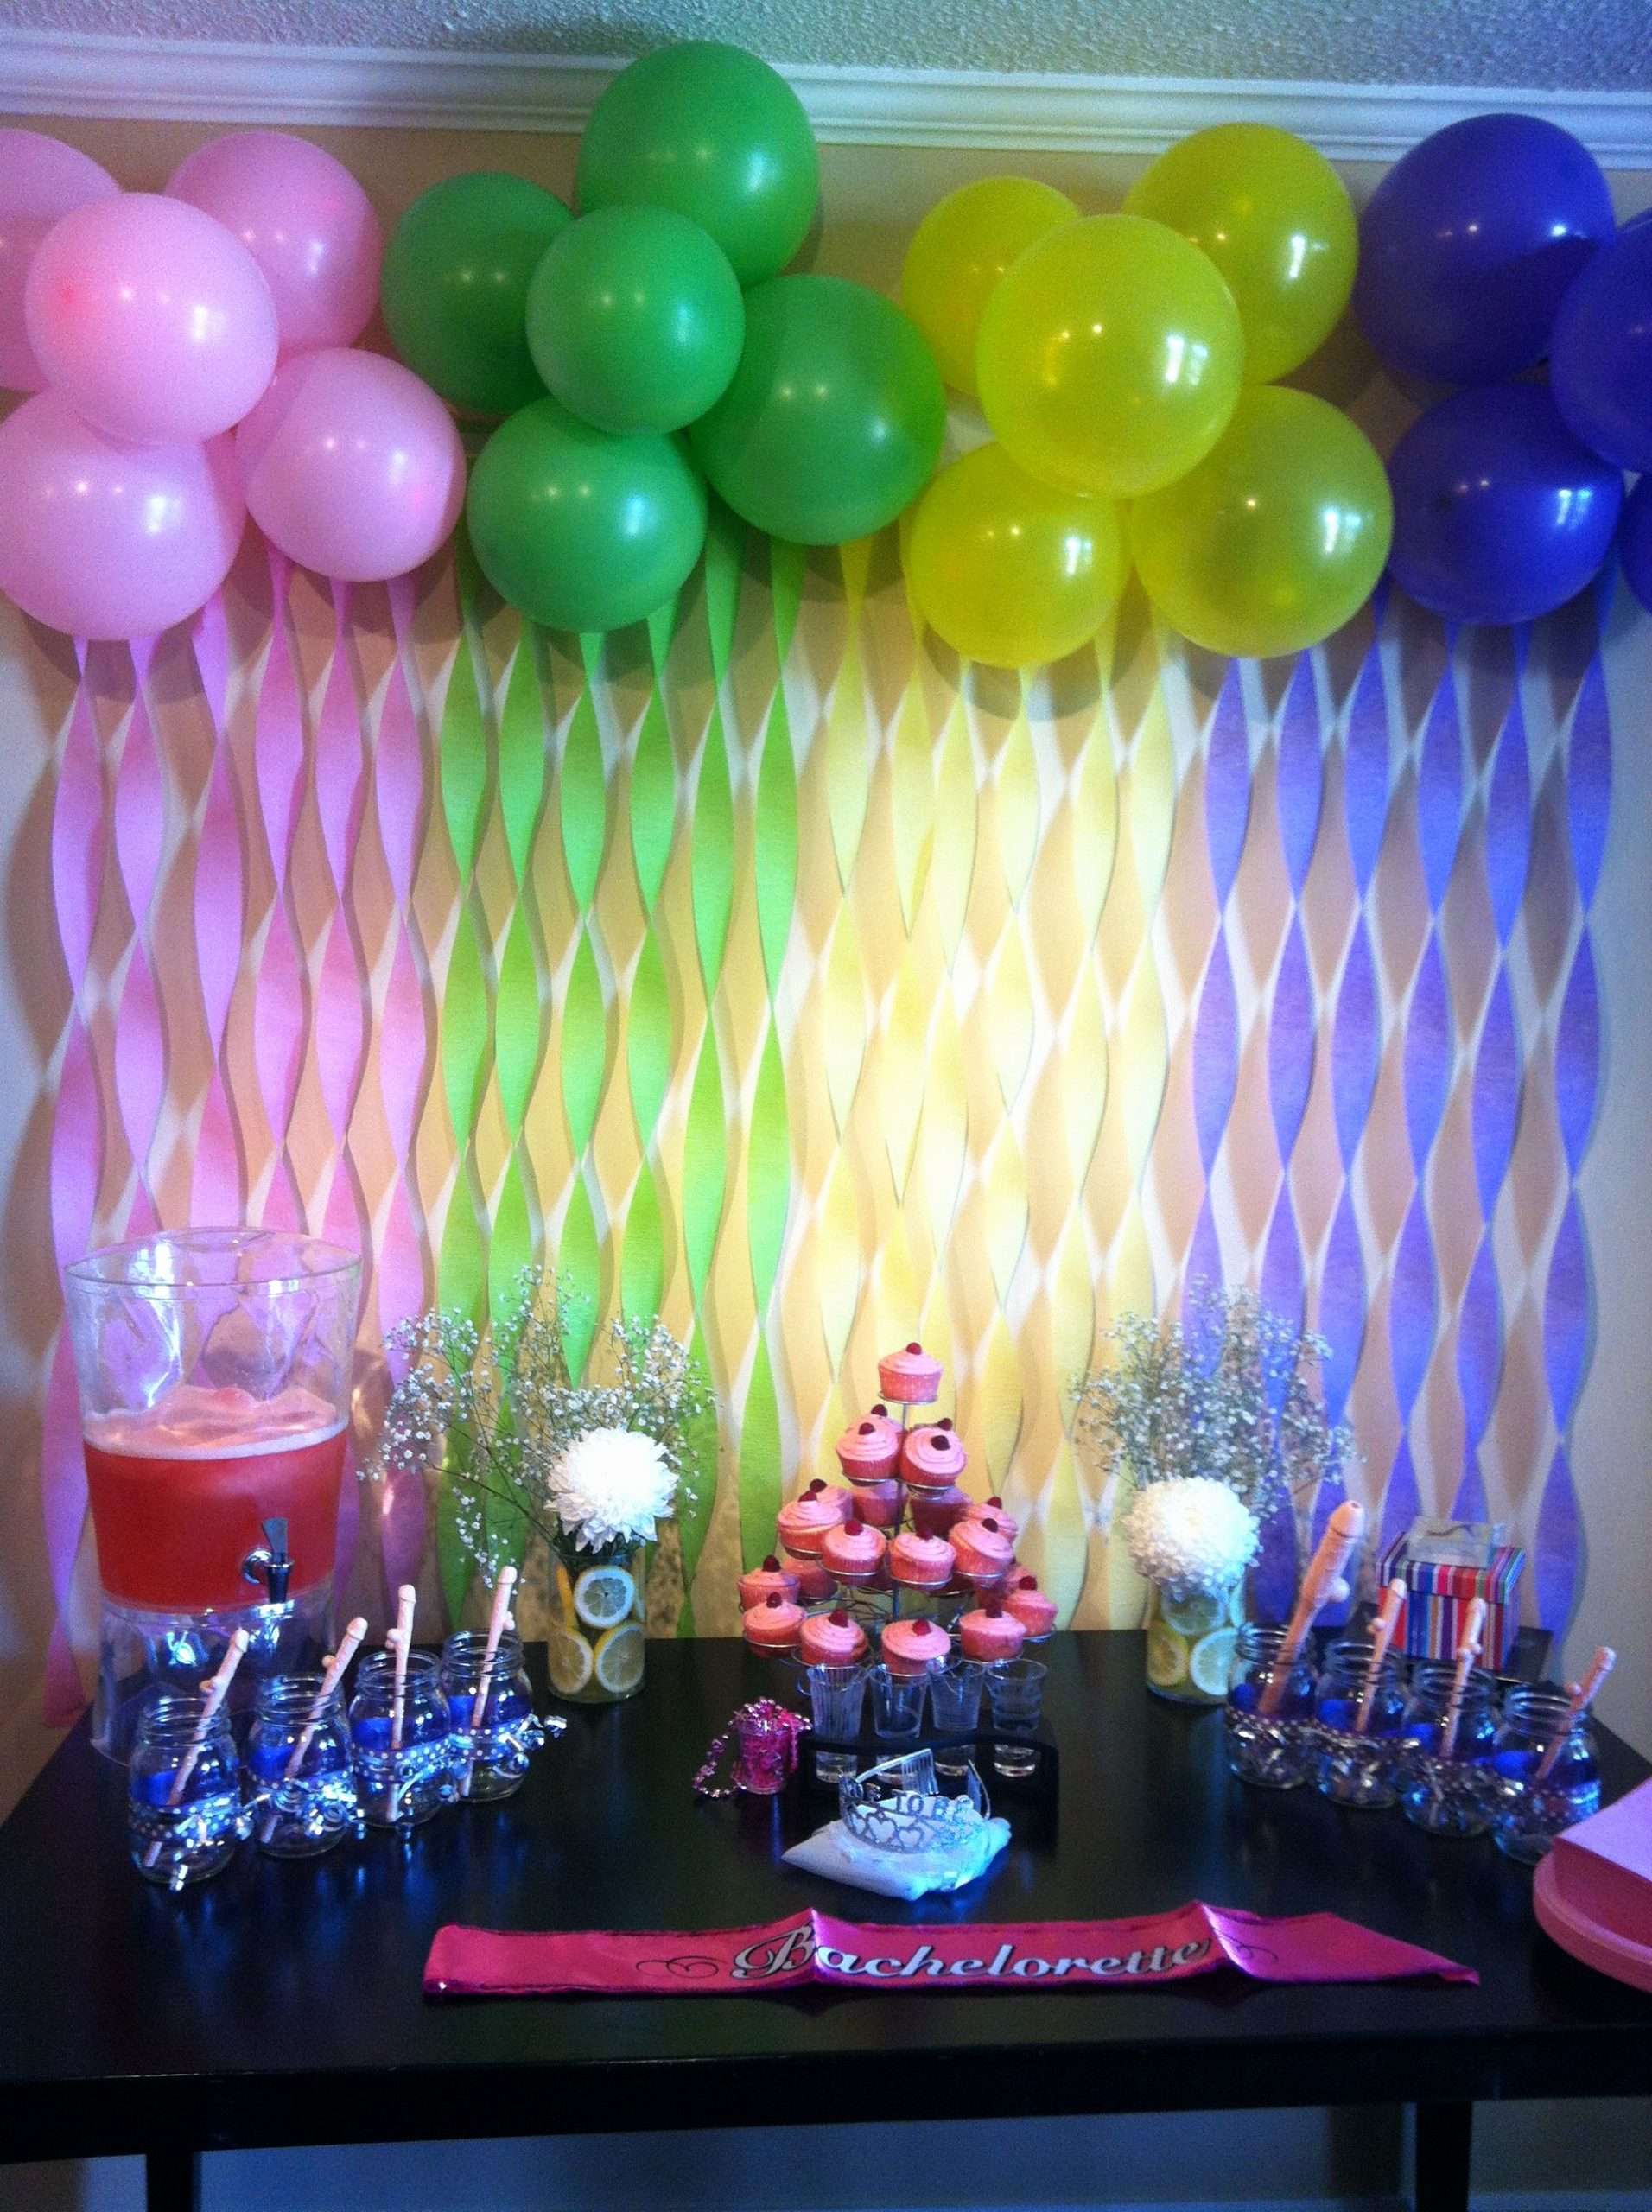 Girlfriend Birthday Decoration Ideas Luxury 9 Best Easy Birthday Decoration Ideas Images On Home Decor Ideas